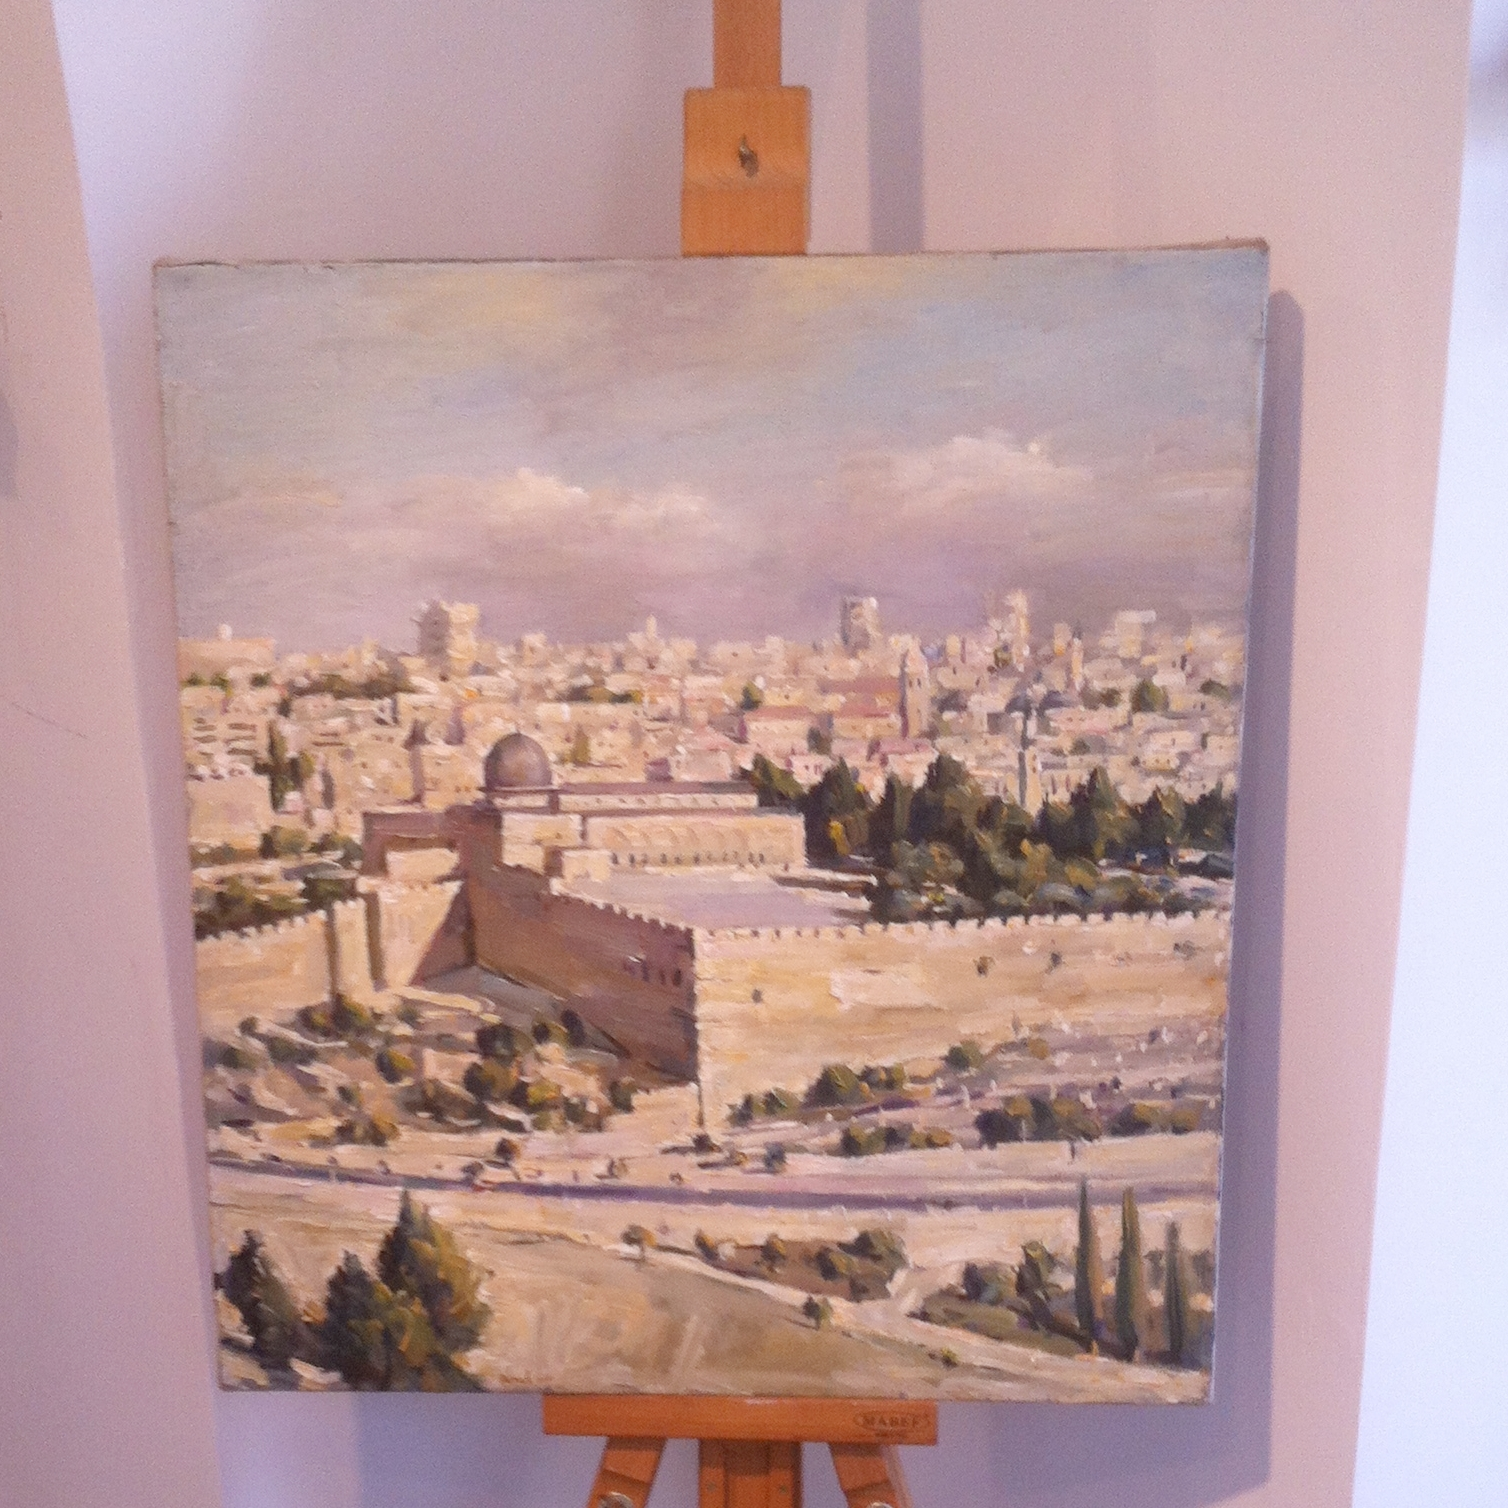 Art gallery in Sefat, 2017